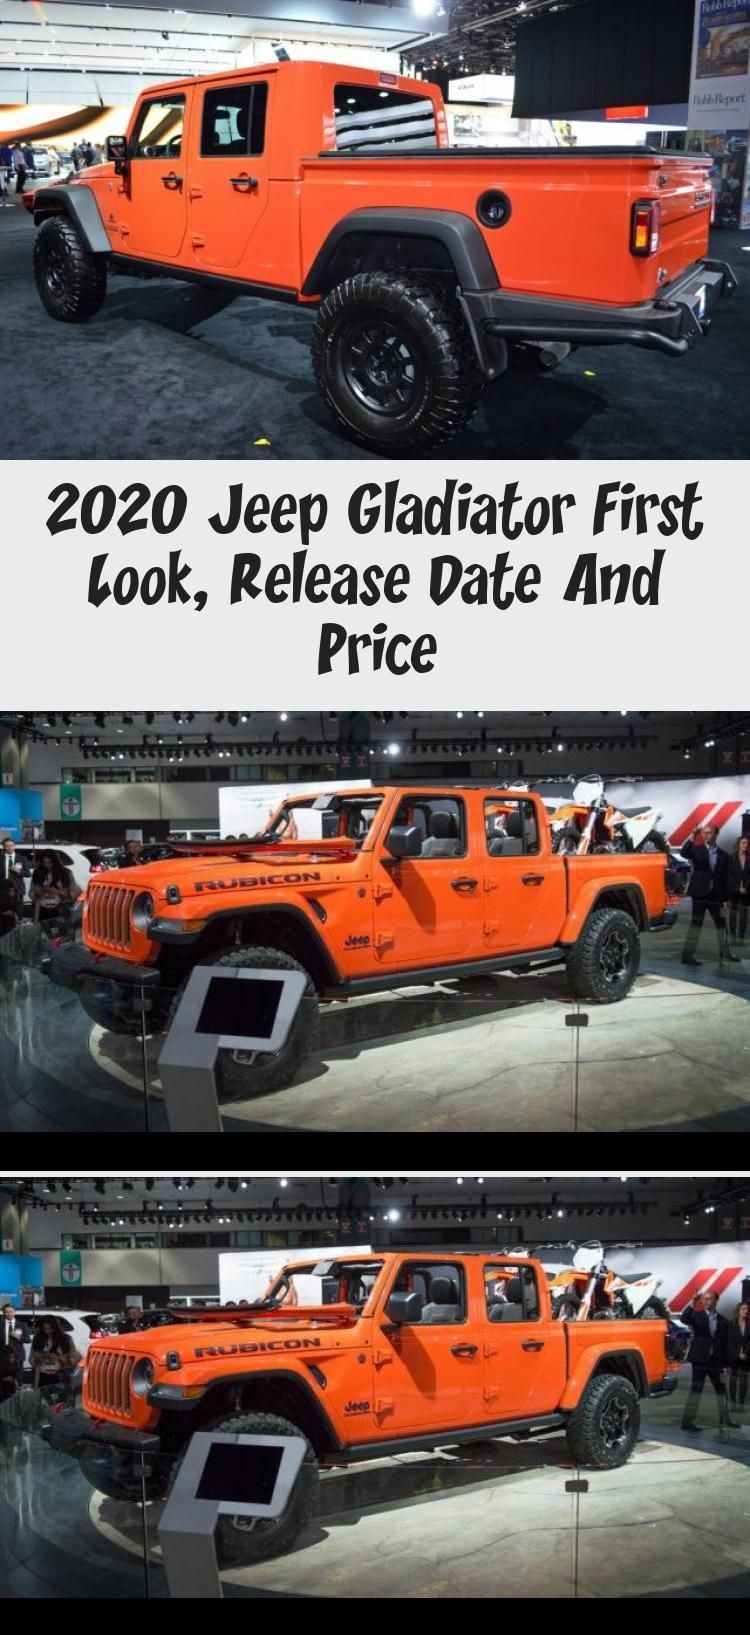 Jeep Gladiator 2020 Price Price And Release Date Di 2020 Rubicon Offroad Motocross